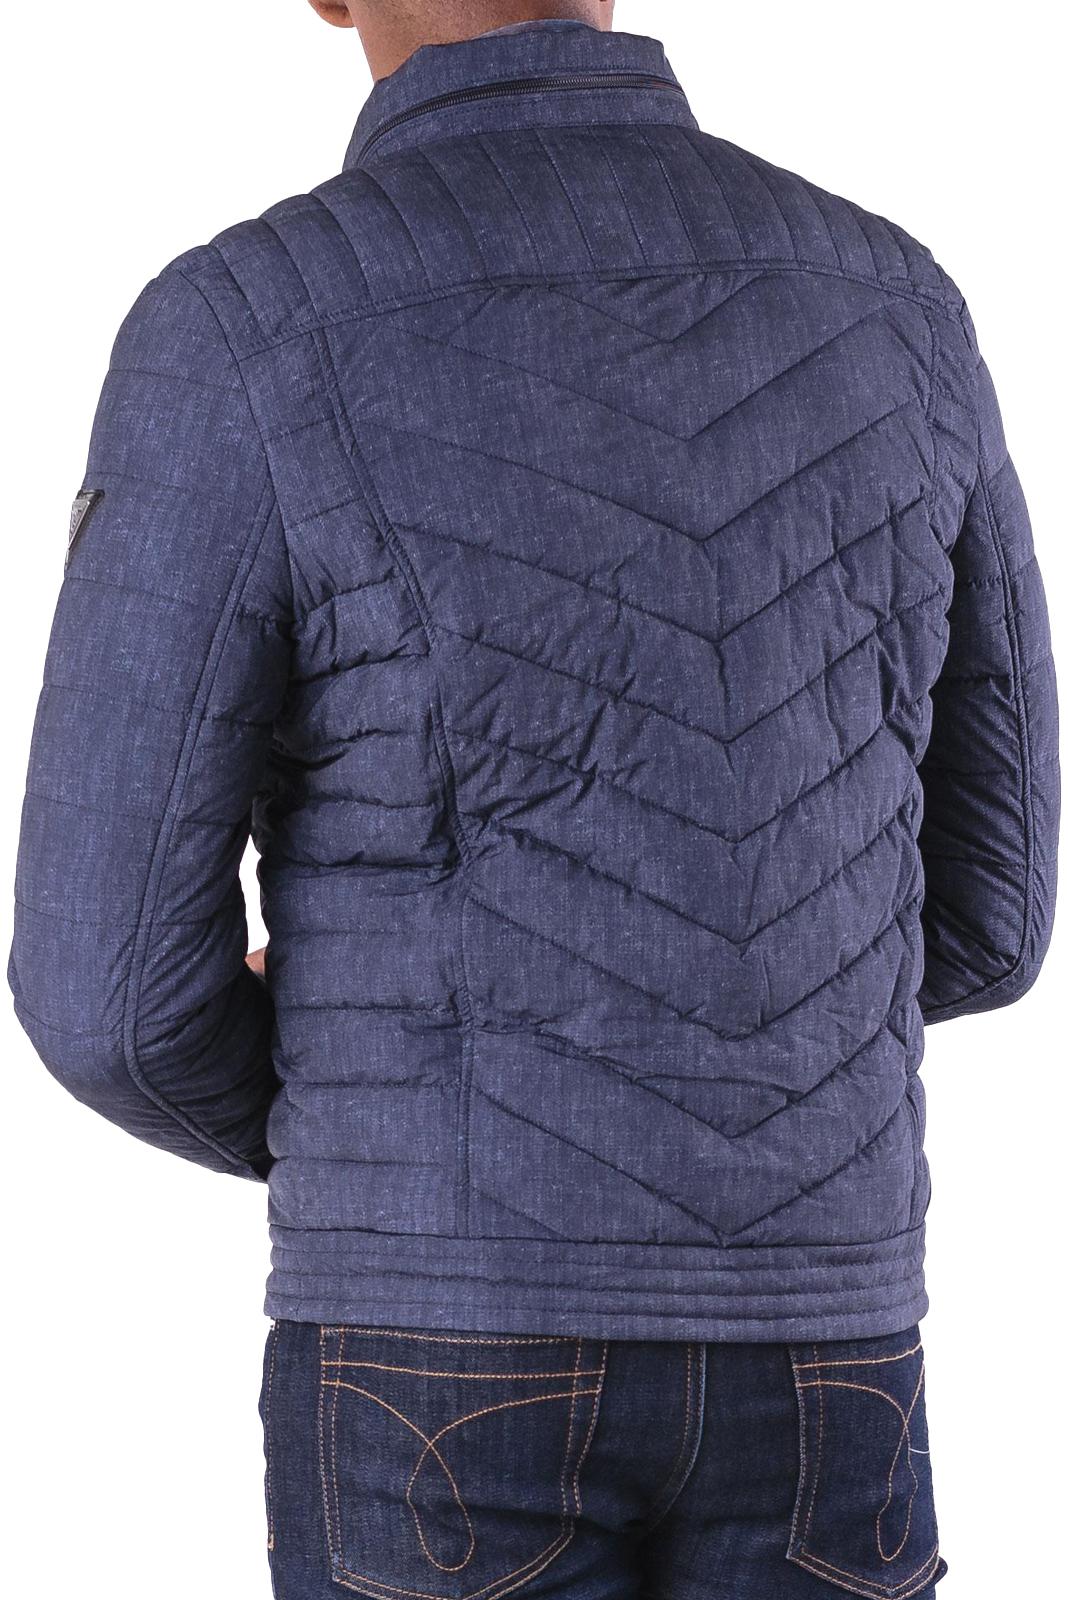 Blousons / doudounes  Guess jeans M84L33 WAJO0 PZP7 BLUE